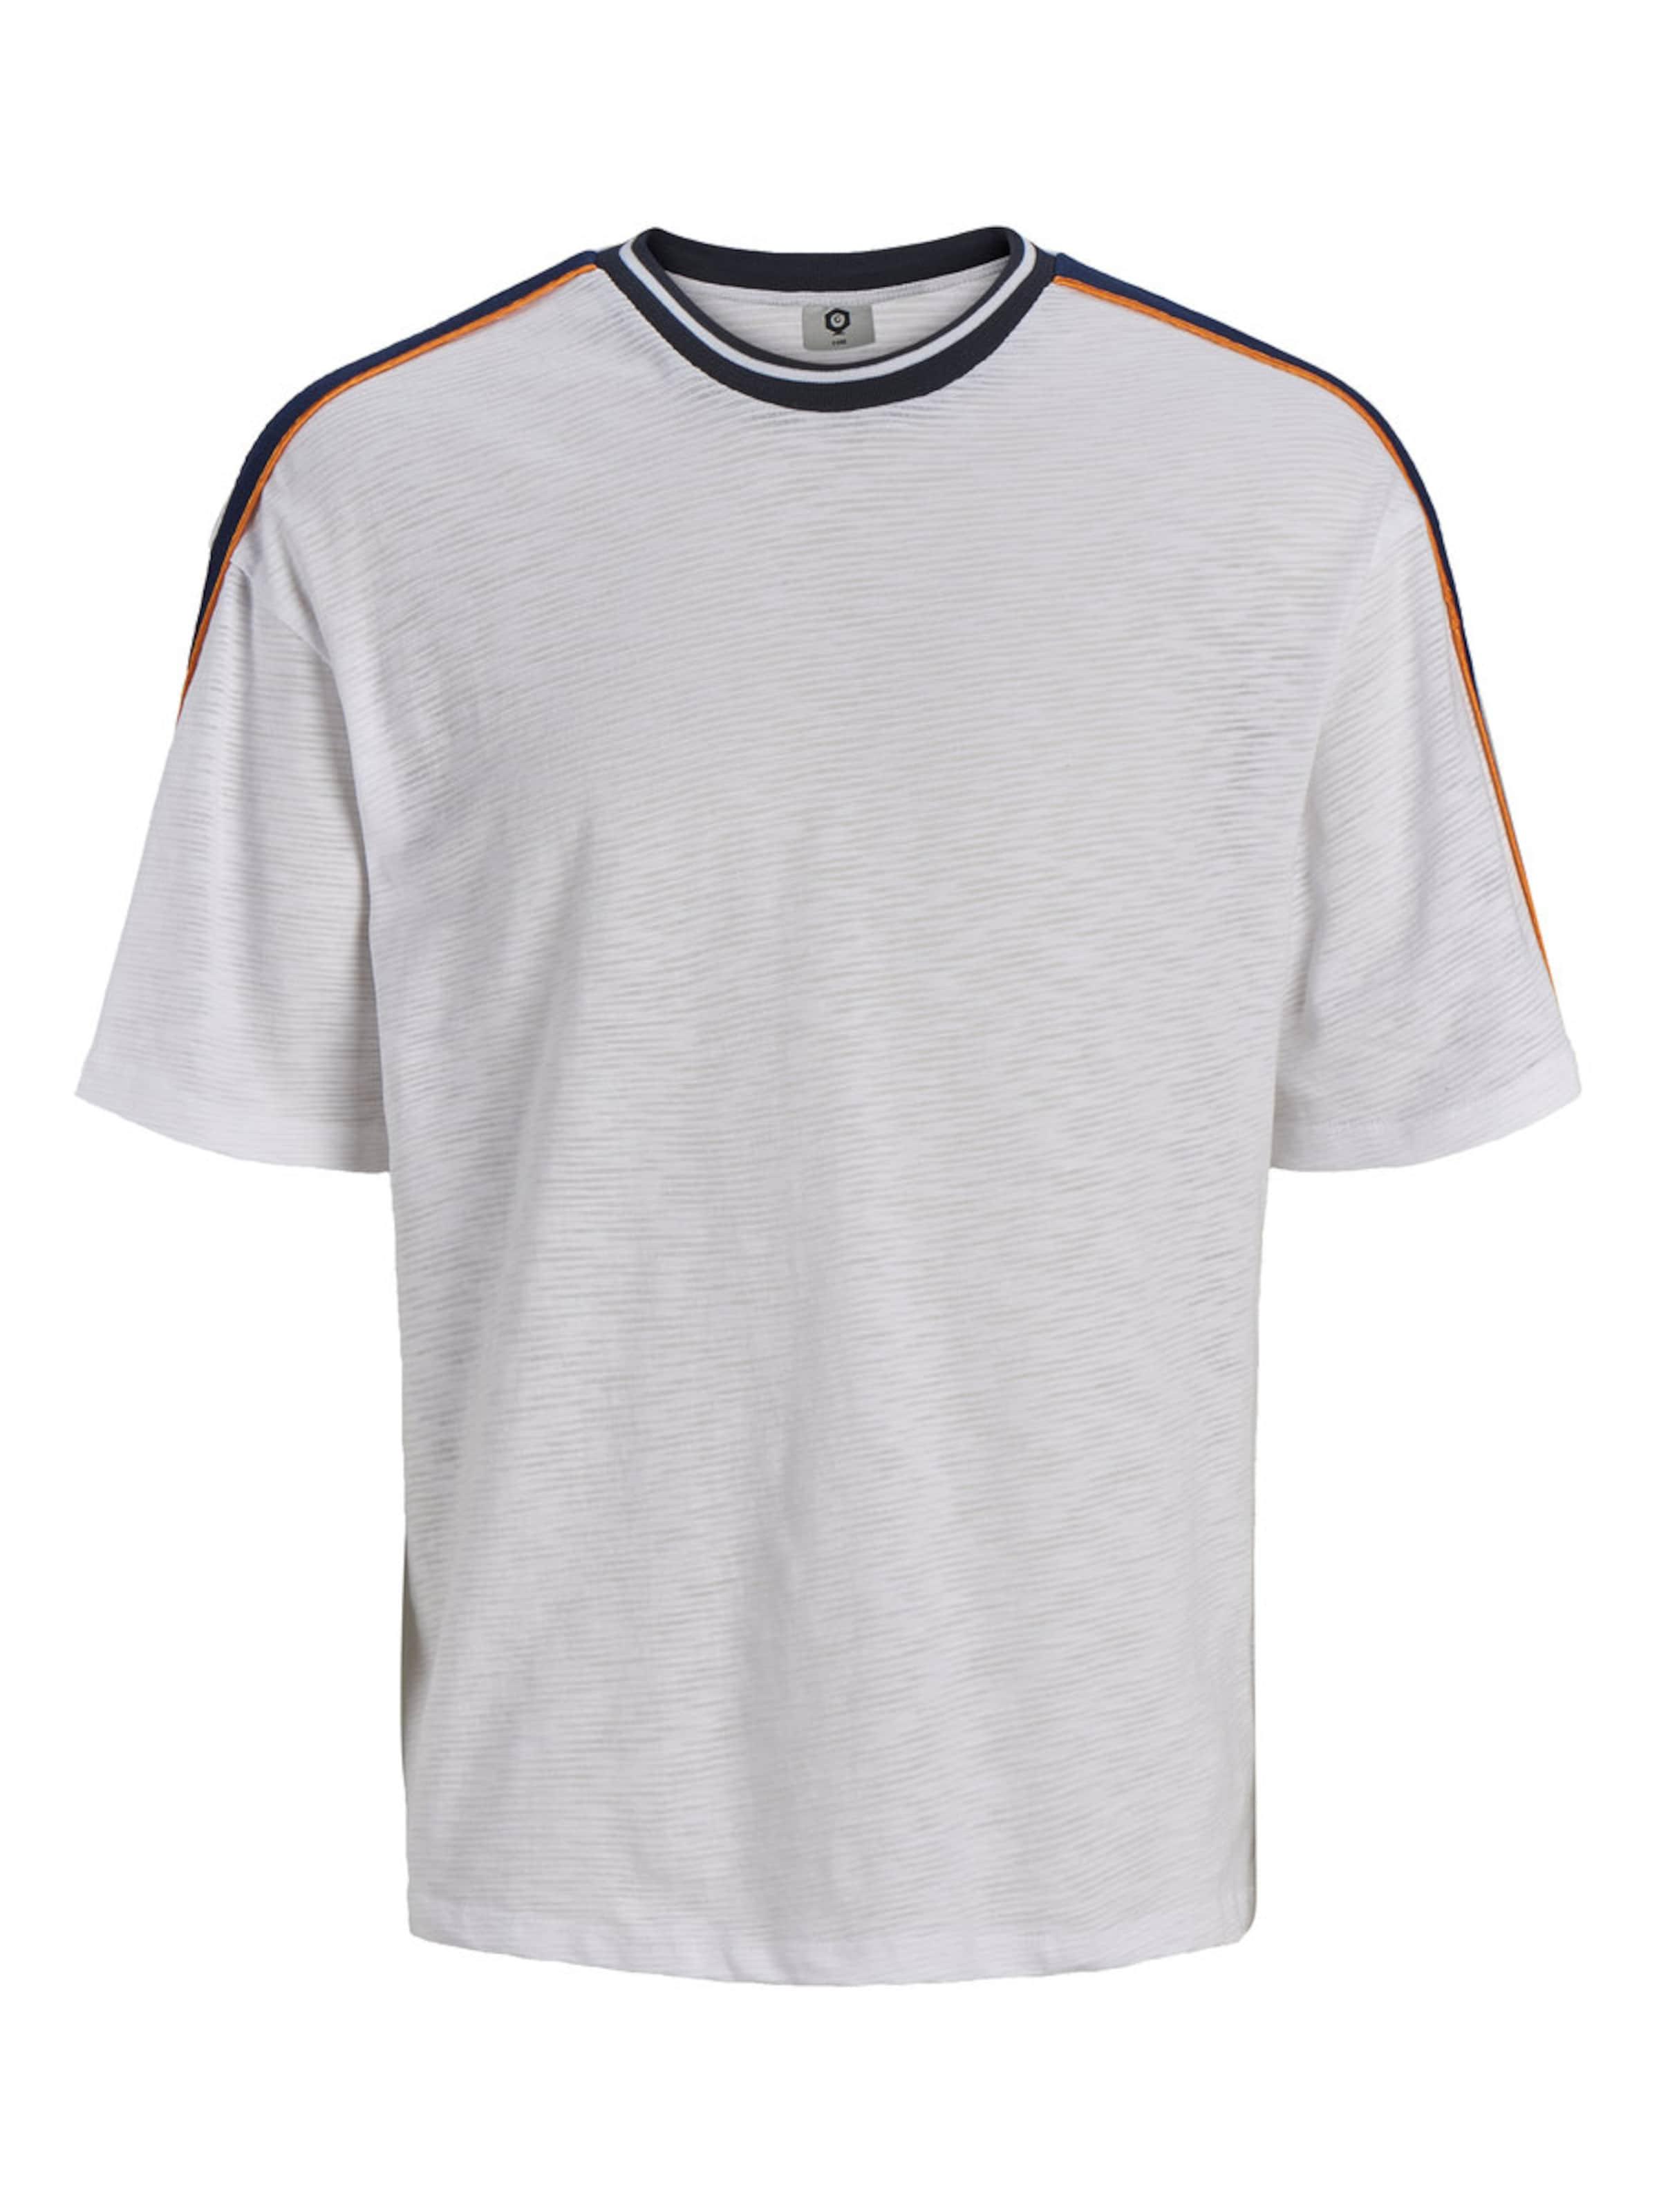 T Jackamp; RougeNoir Chiné Jones Blanc shirt En vwnmN8O0